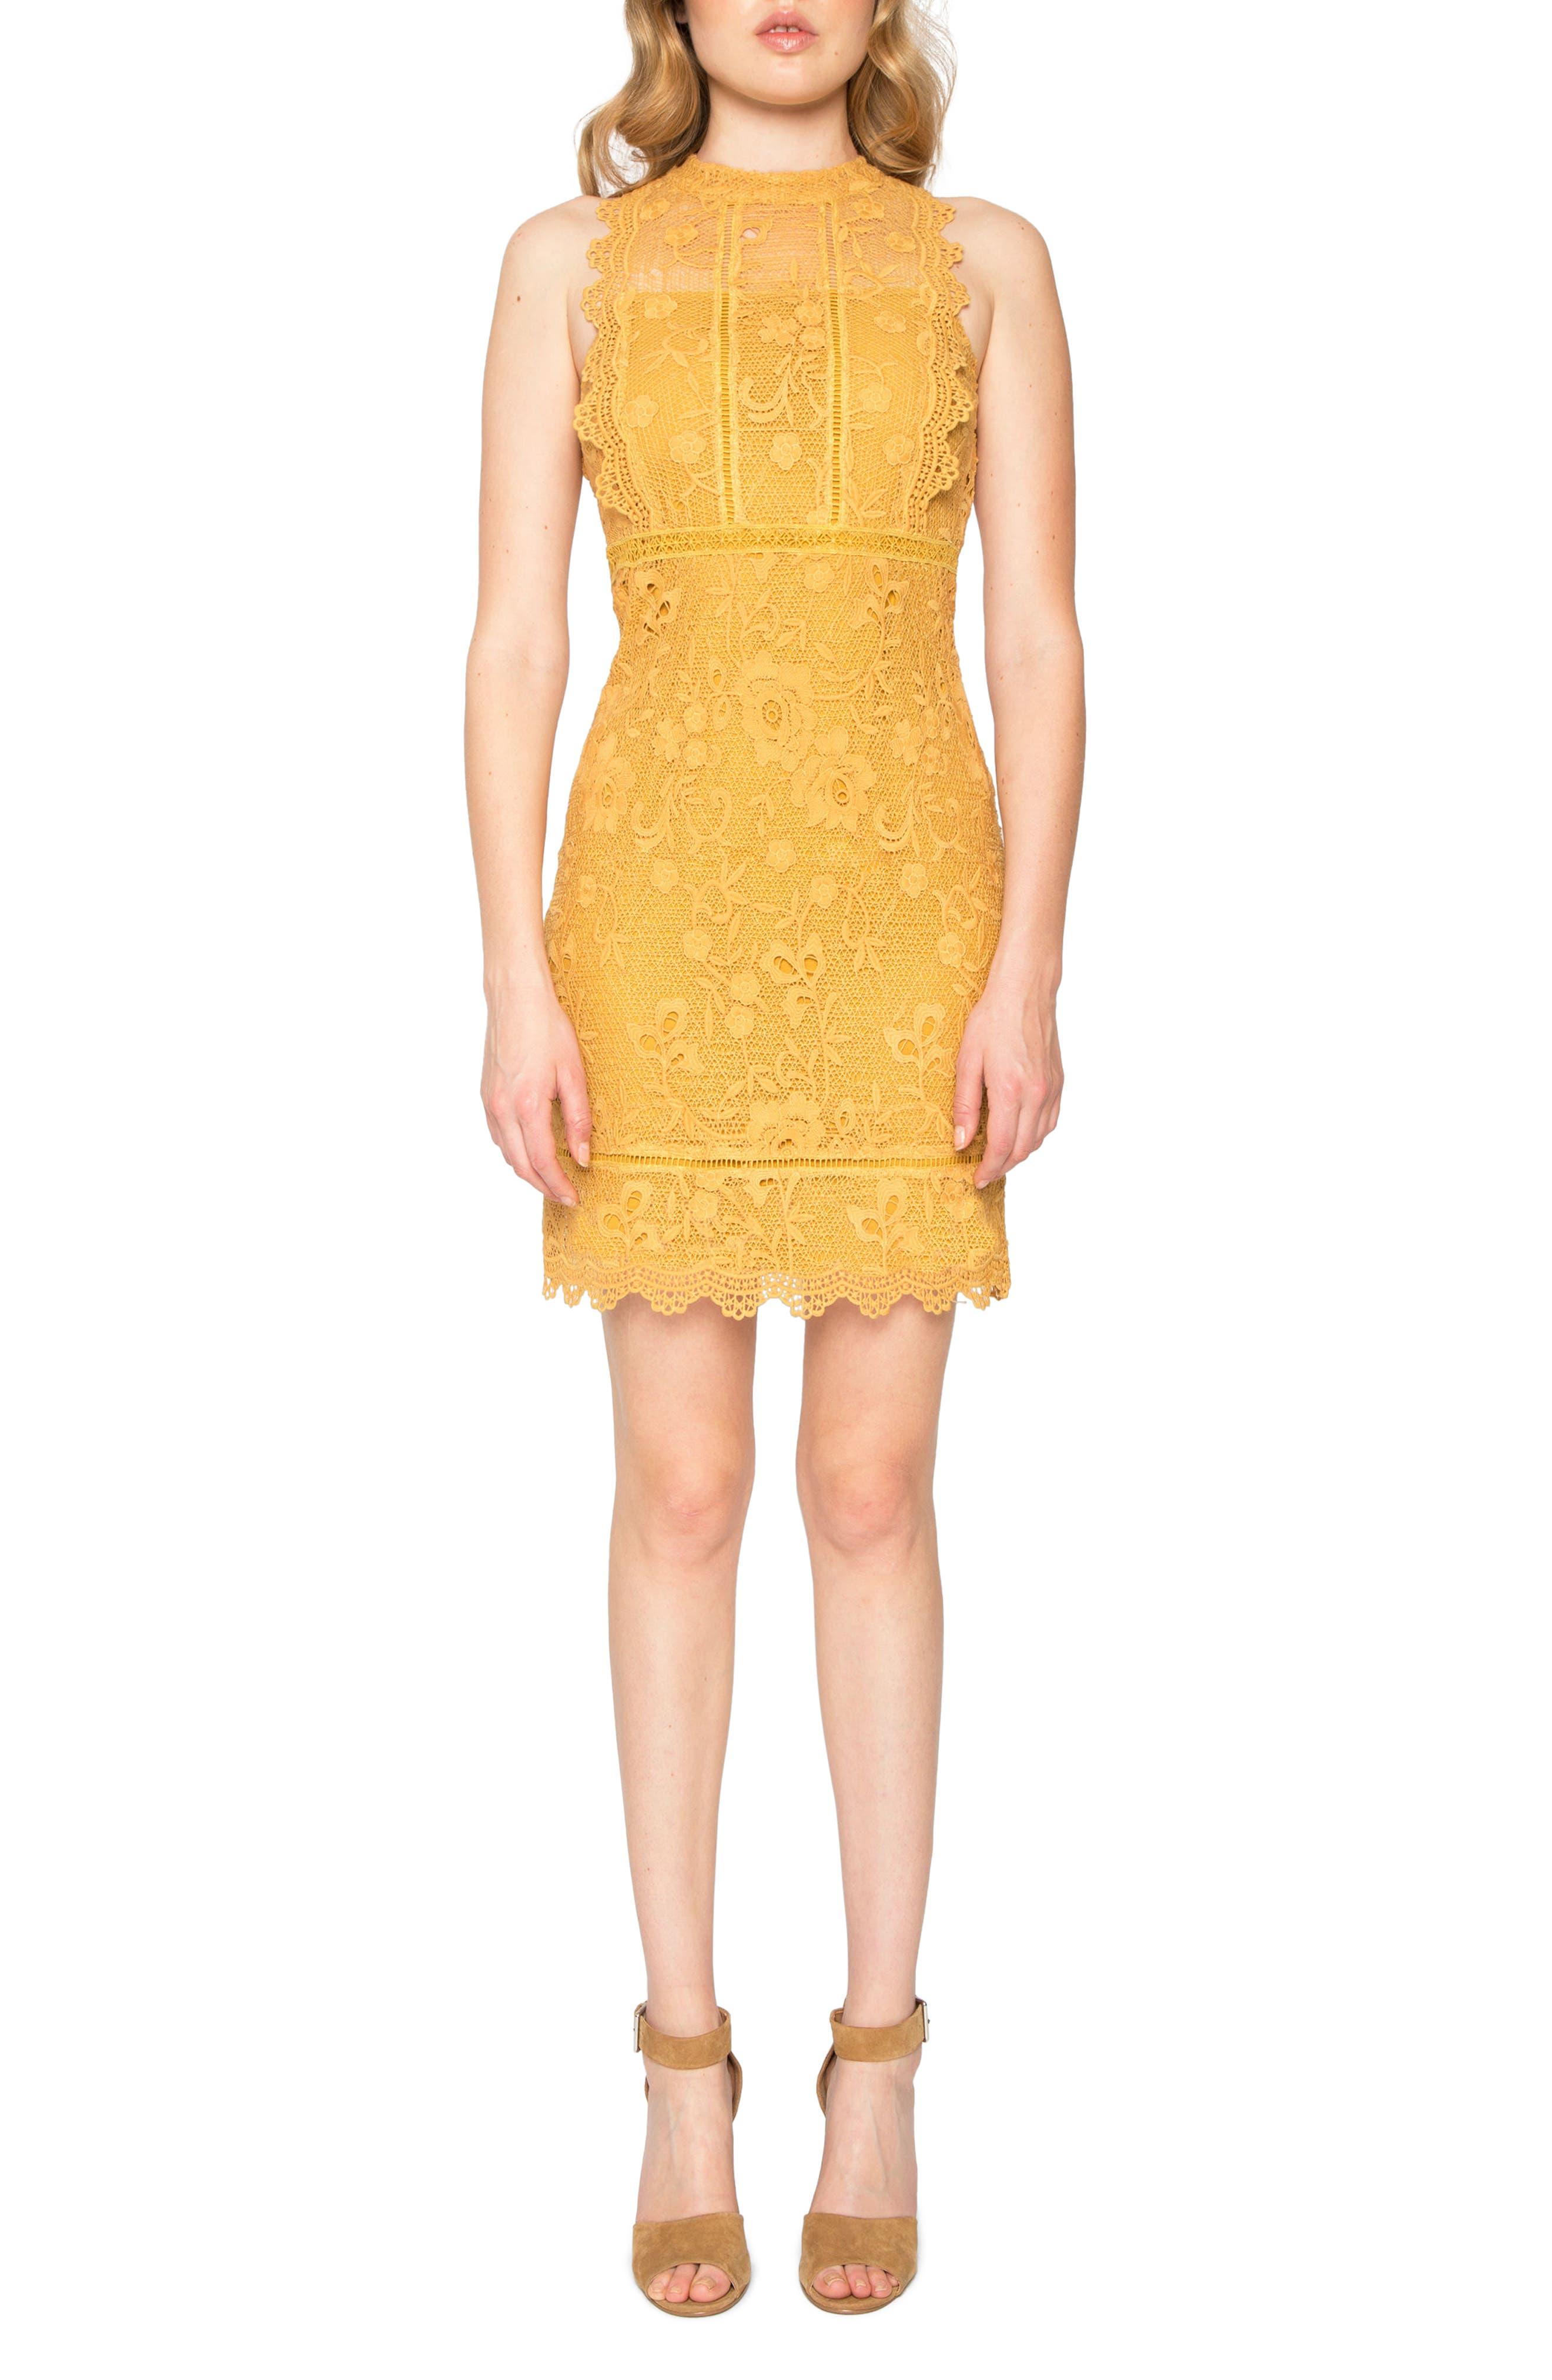 Main Image - Willow & Clay Lace Sheath Dress